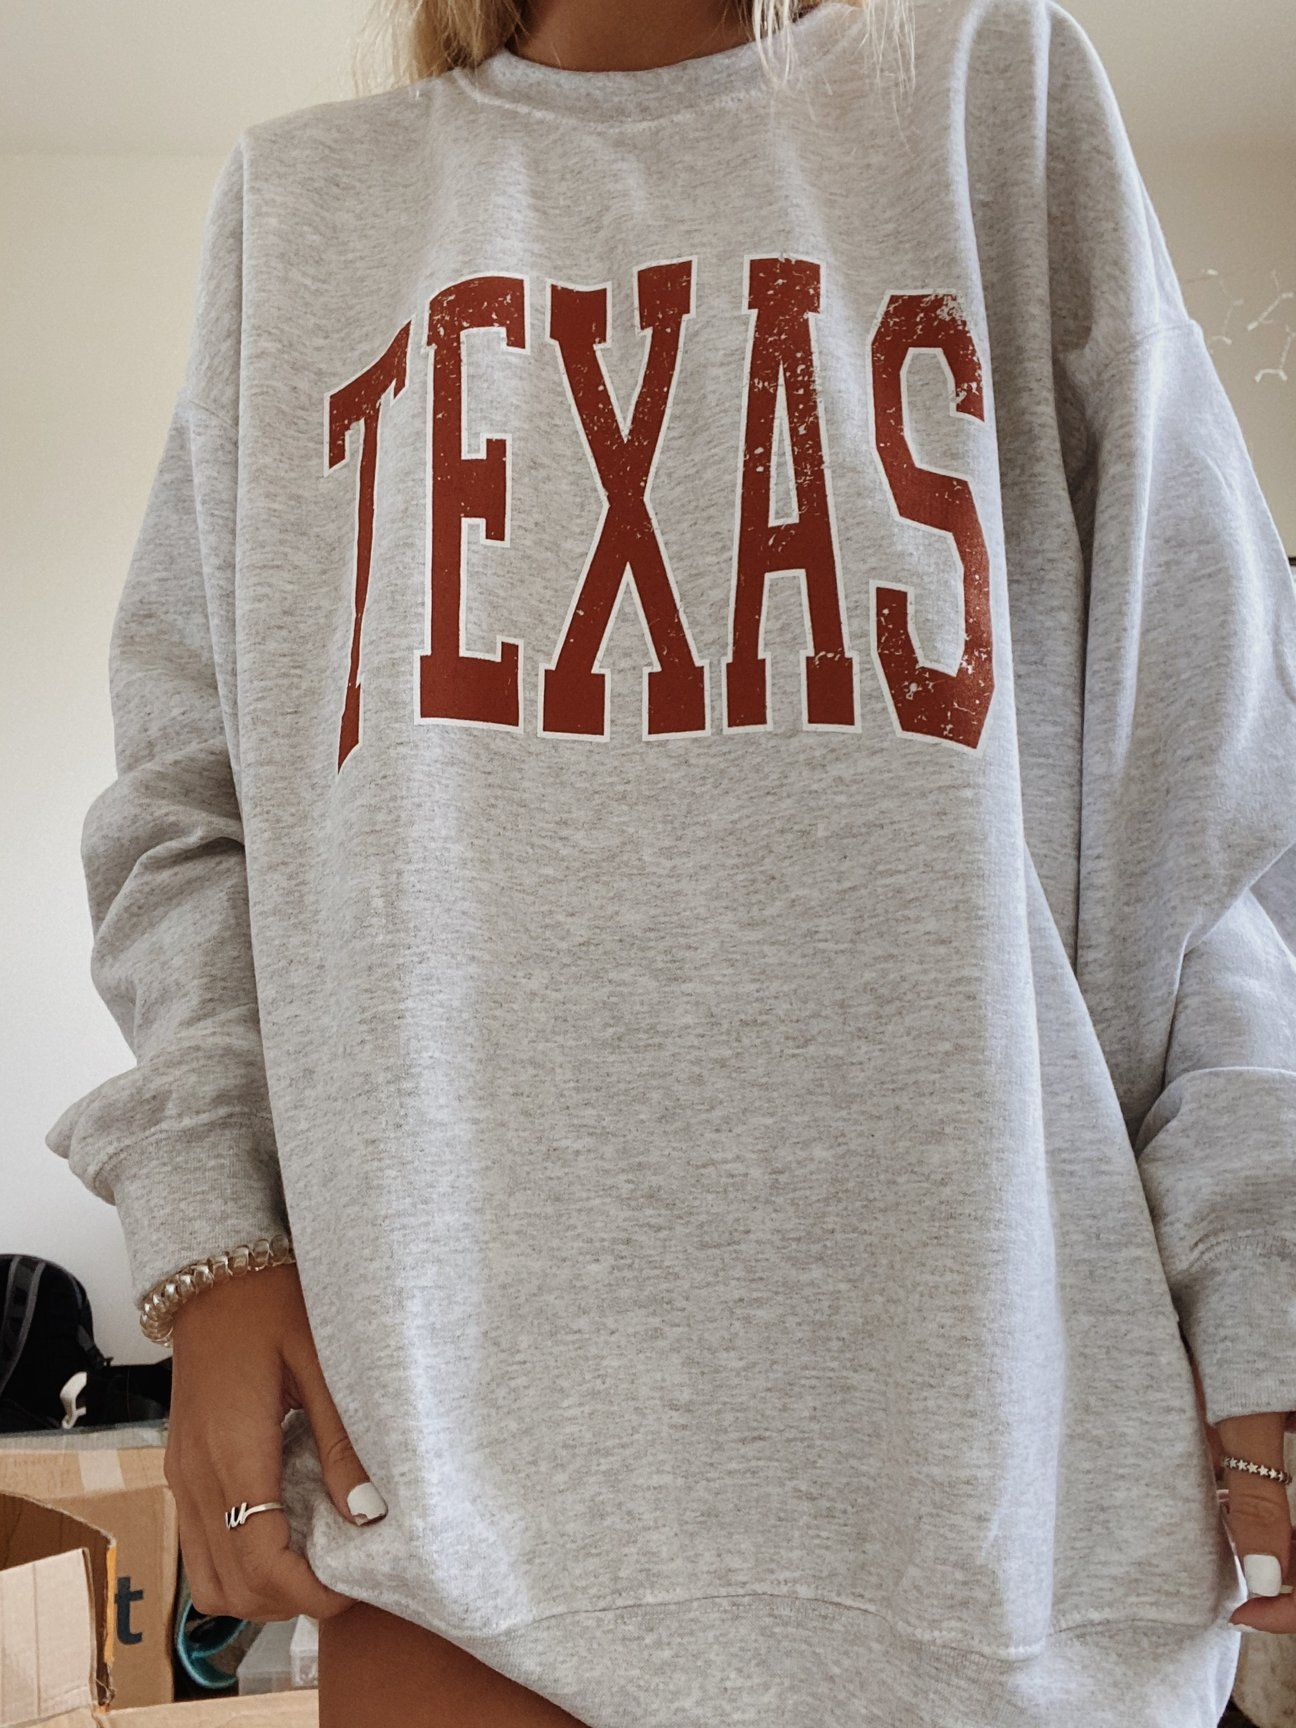 Original Texas Crewneck Trendy Hoodies Sweatshirts Women Vintage Hoodies [ 1728 x 1296 Pixel ]